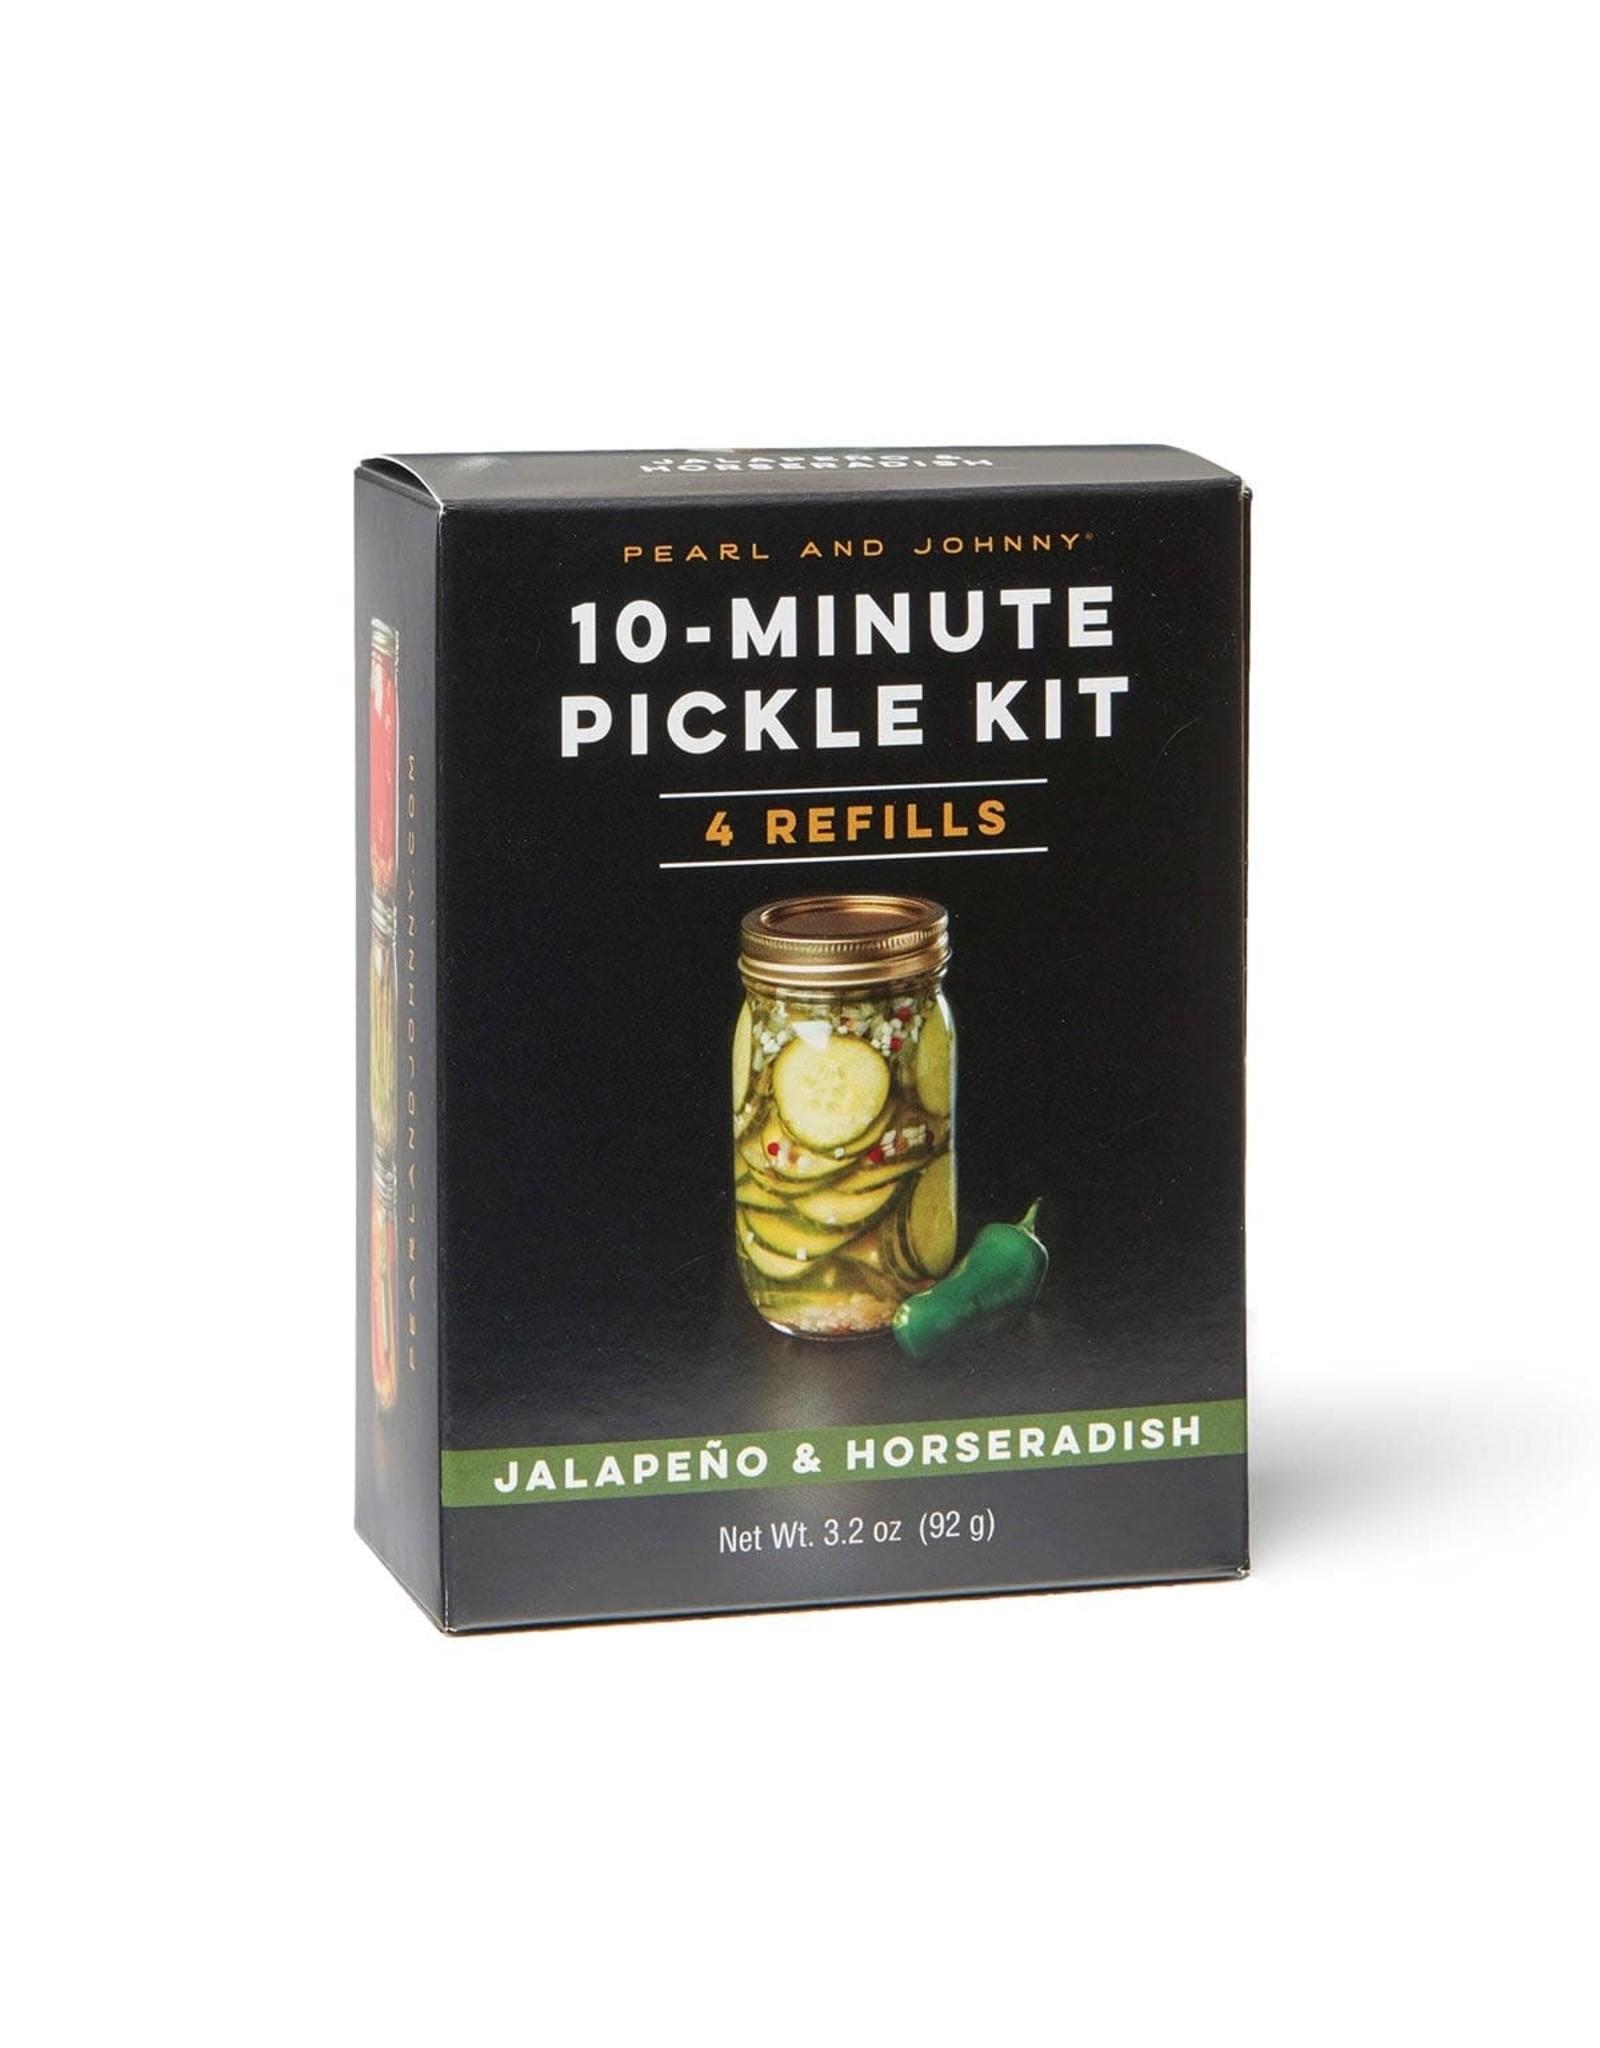 Wind & Willow Jalapeno & Horseradish Pickle Refill Kit